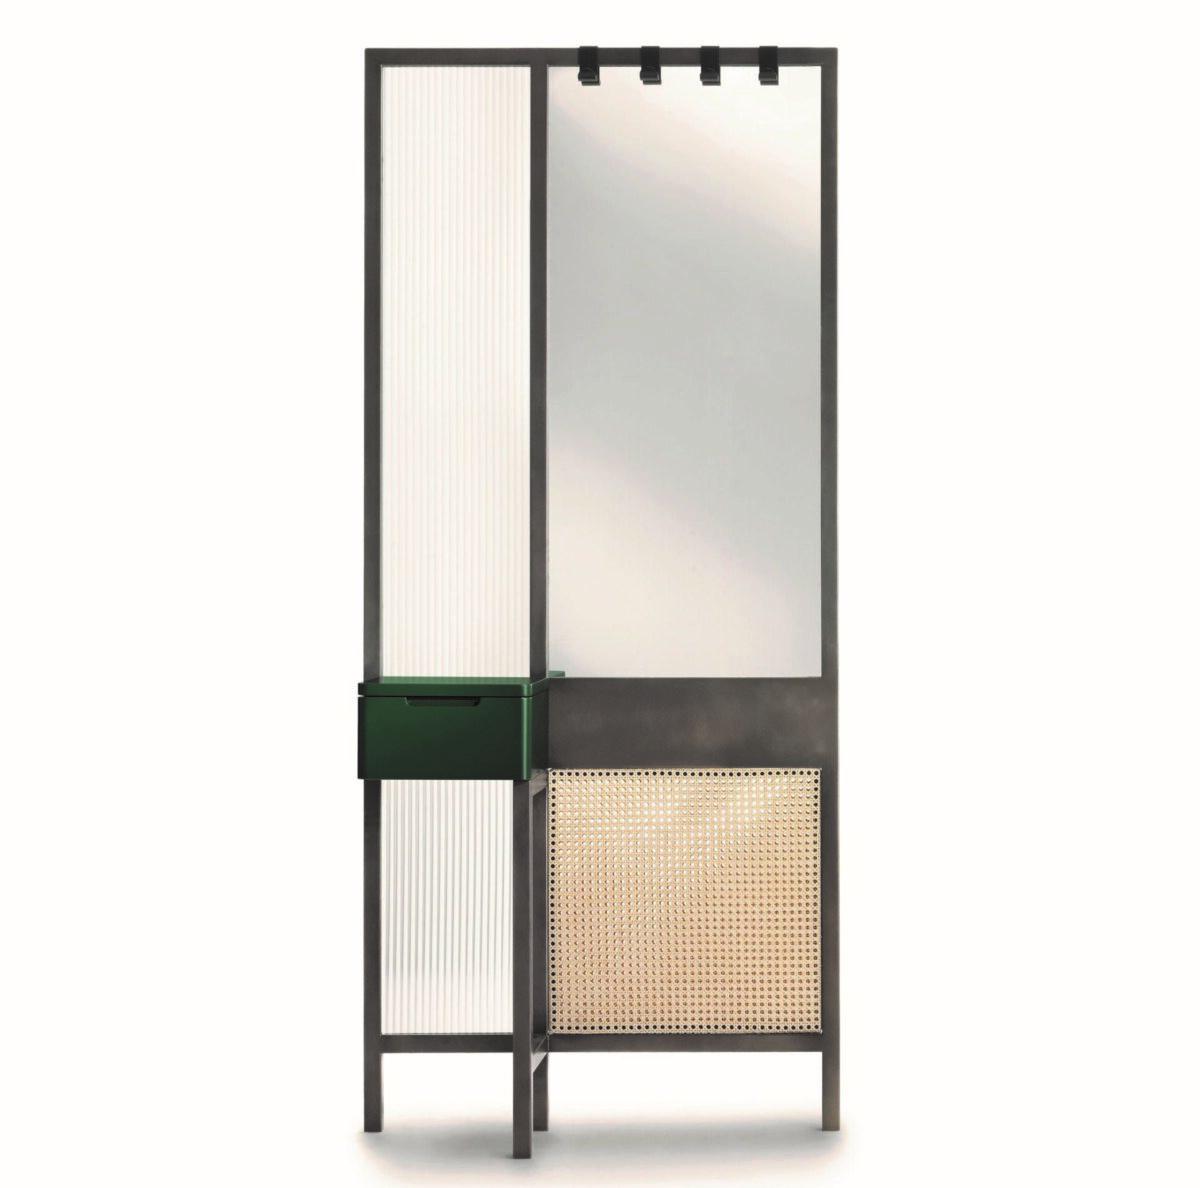 arflex-Threshold design Neri&Hu